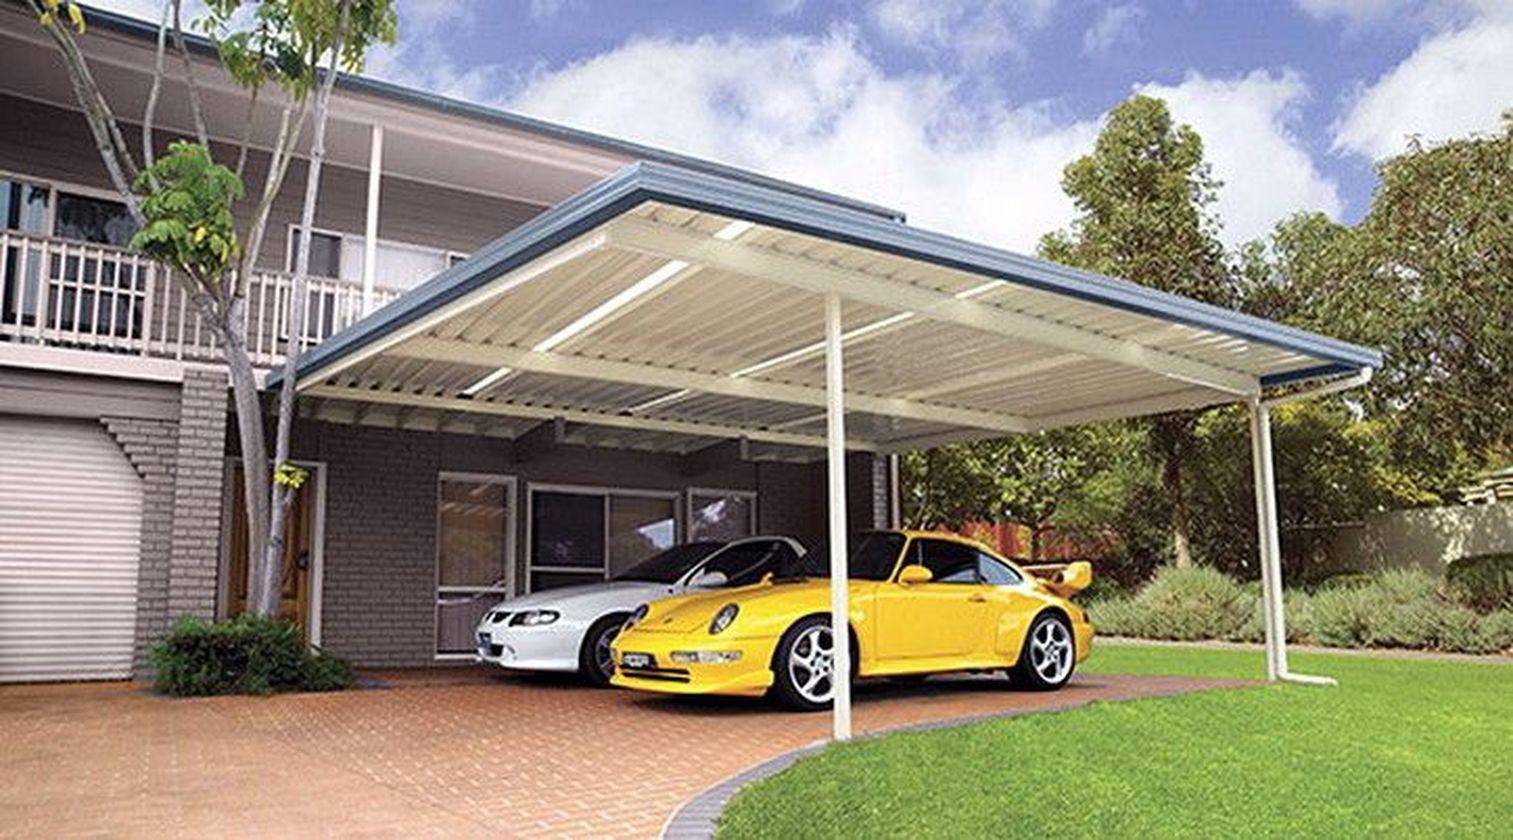 54 Cool Car Garage Design Ideas For Minimalist Home Carport Designs Garage Design House Architecture Design